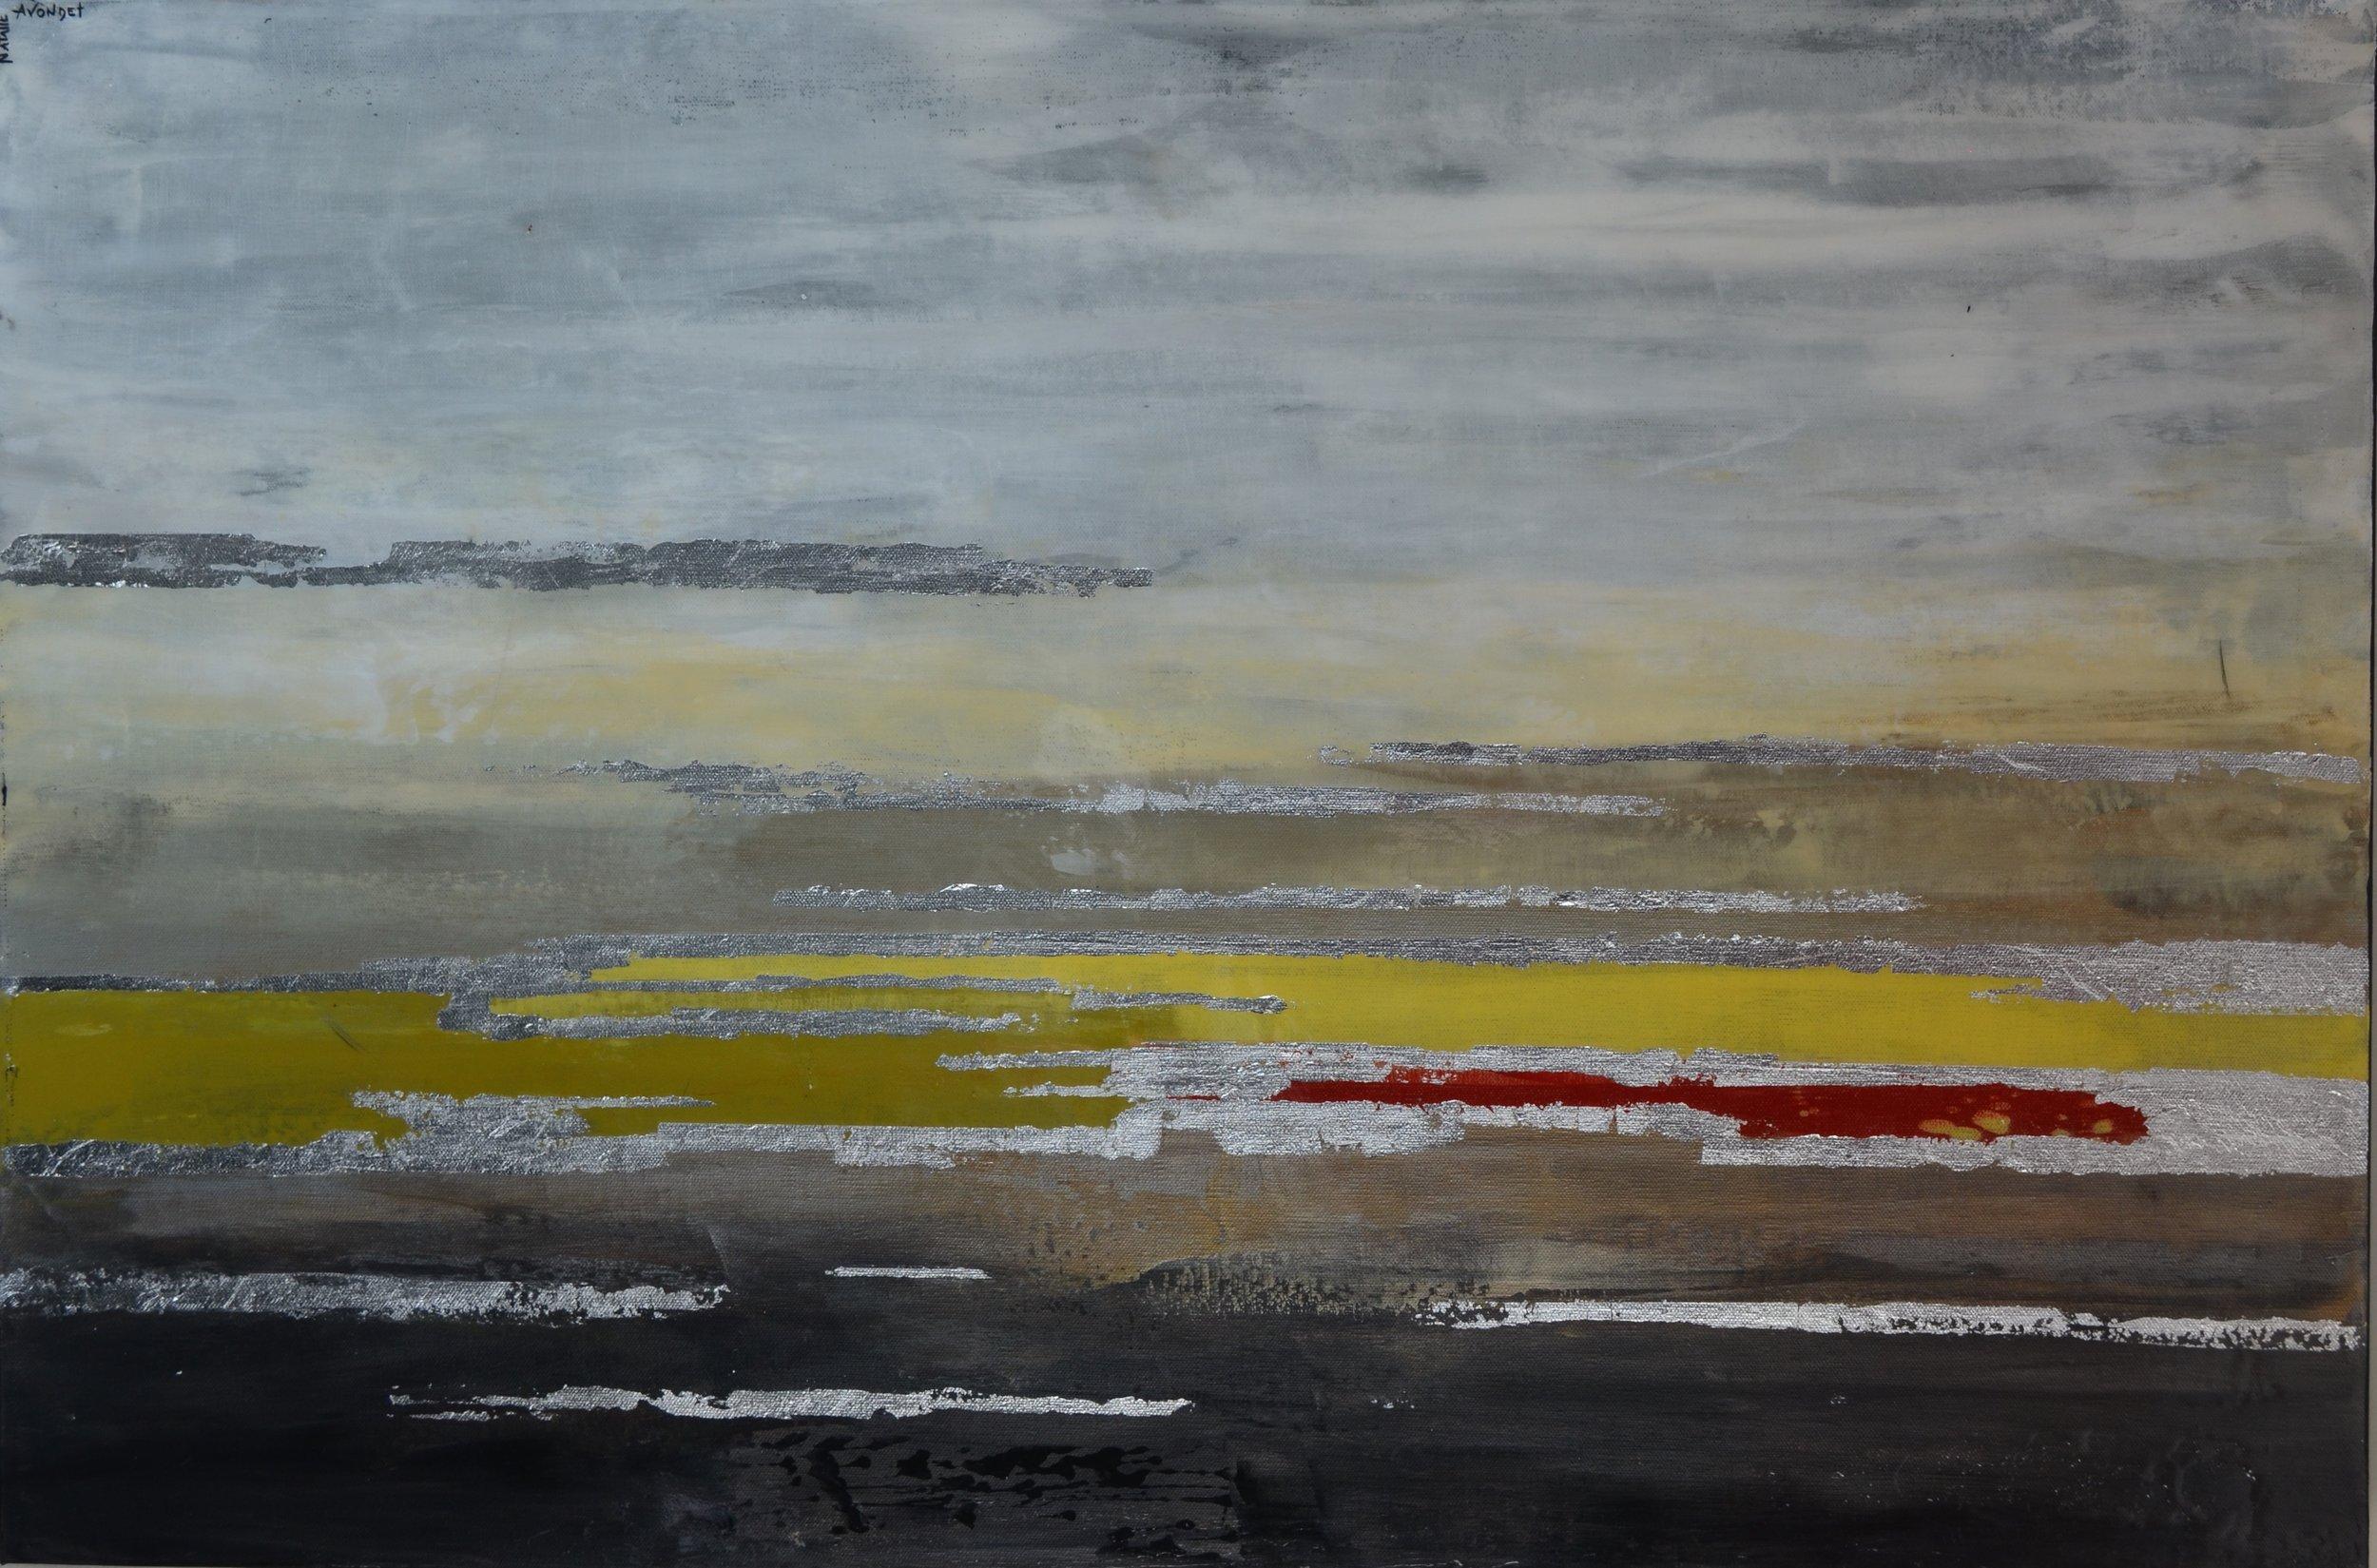 https://www.saatchiart.com/art/Painting-Poppies-and-Split-Pea-Soup/1086248/4422650/view